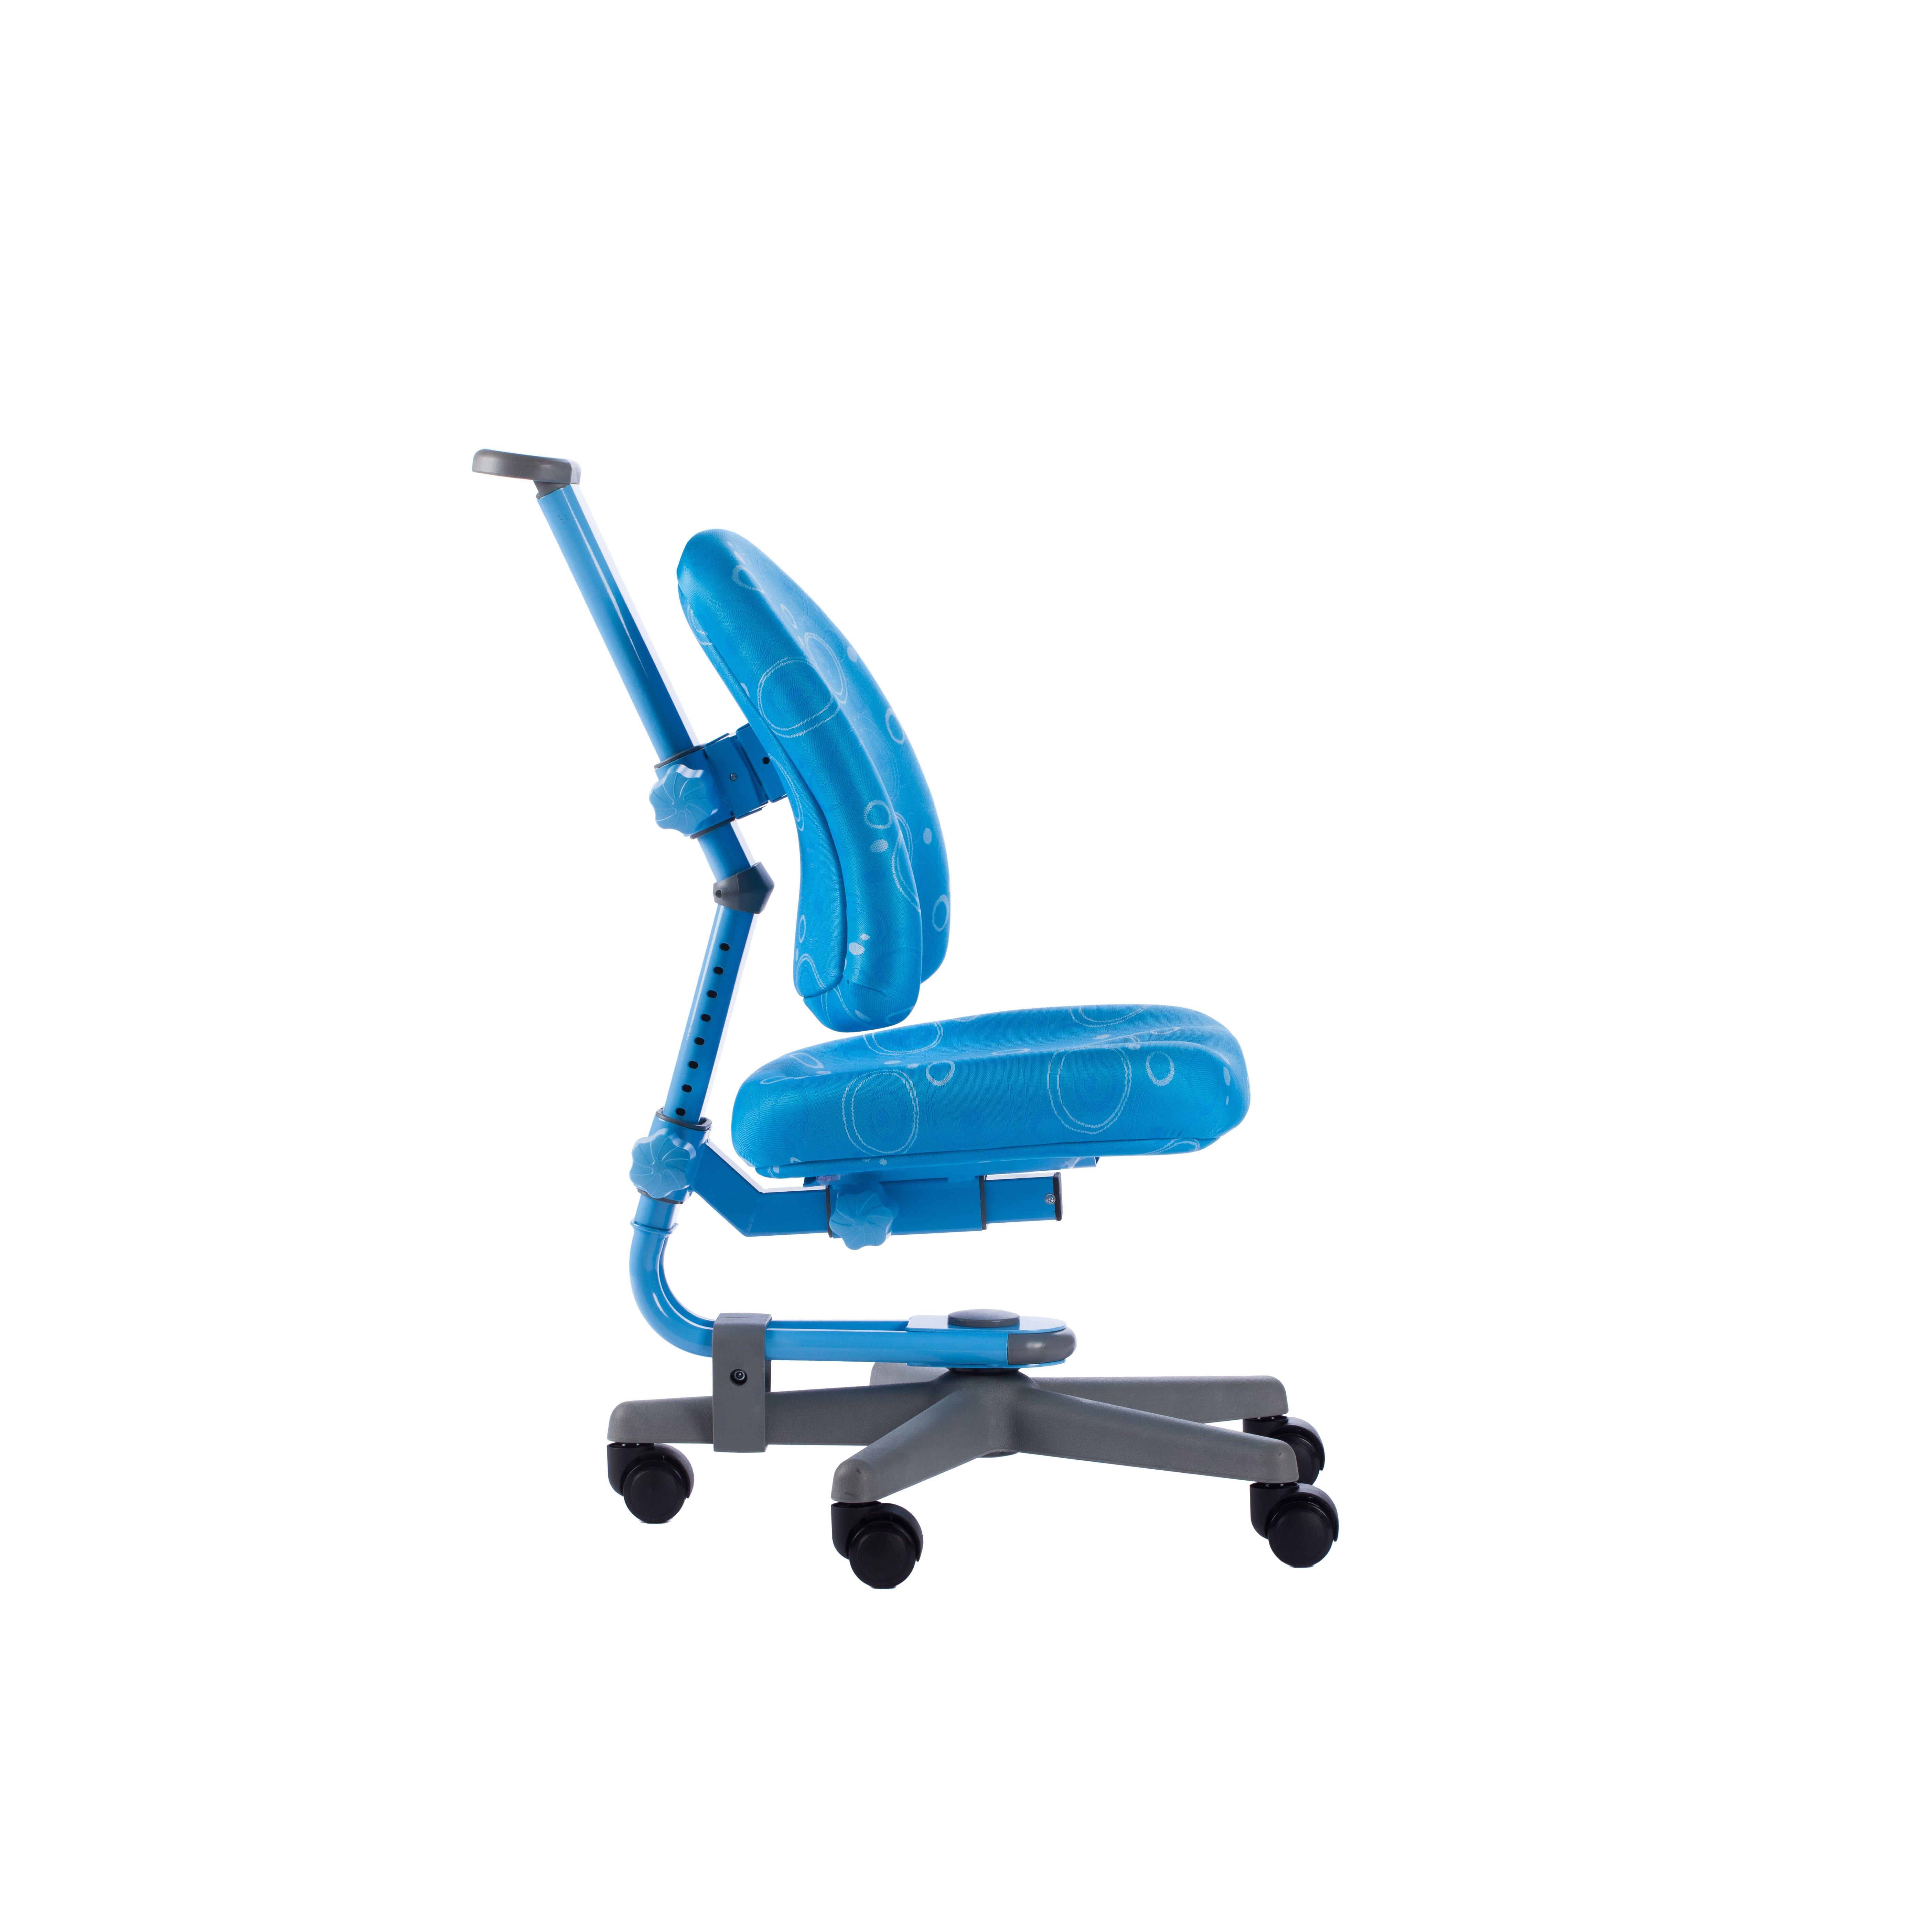 Apexdesk Devaise Height Adjustable Standing Desk Sit Stand